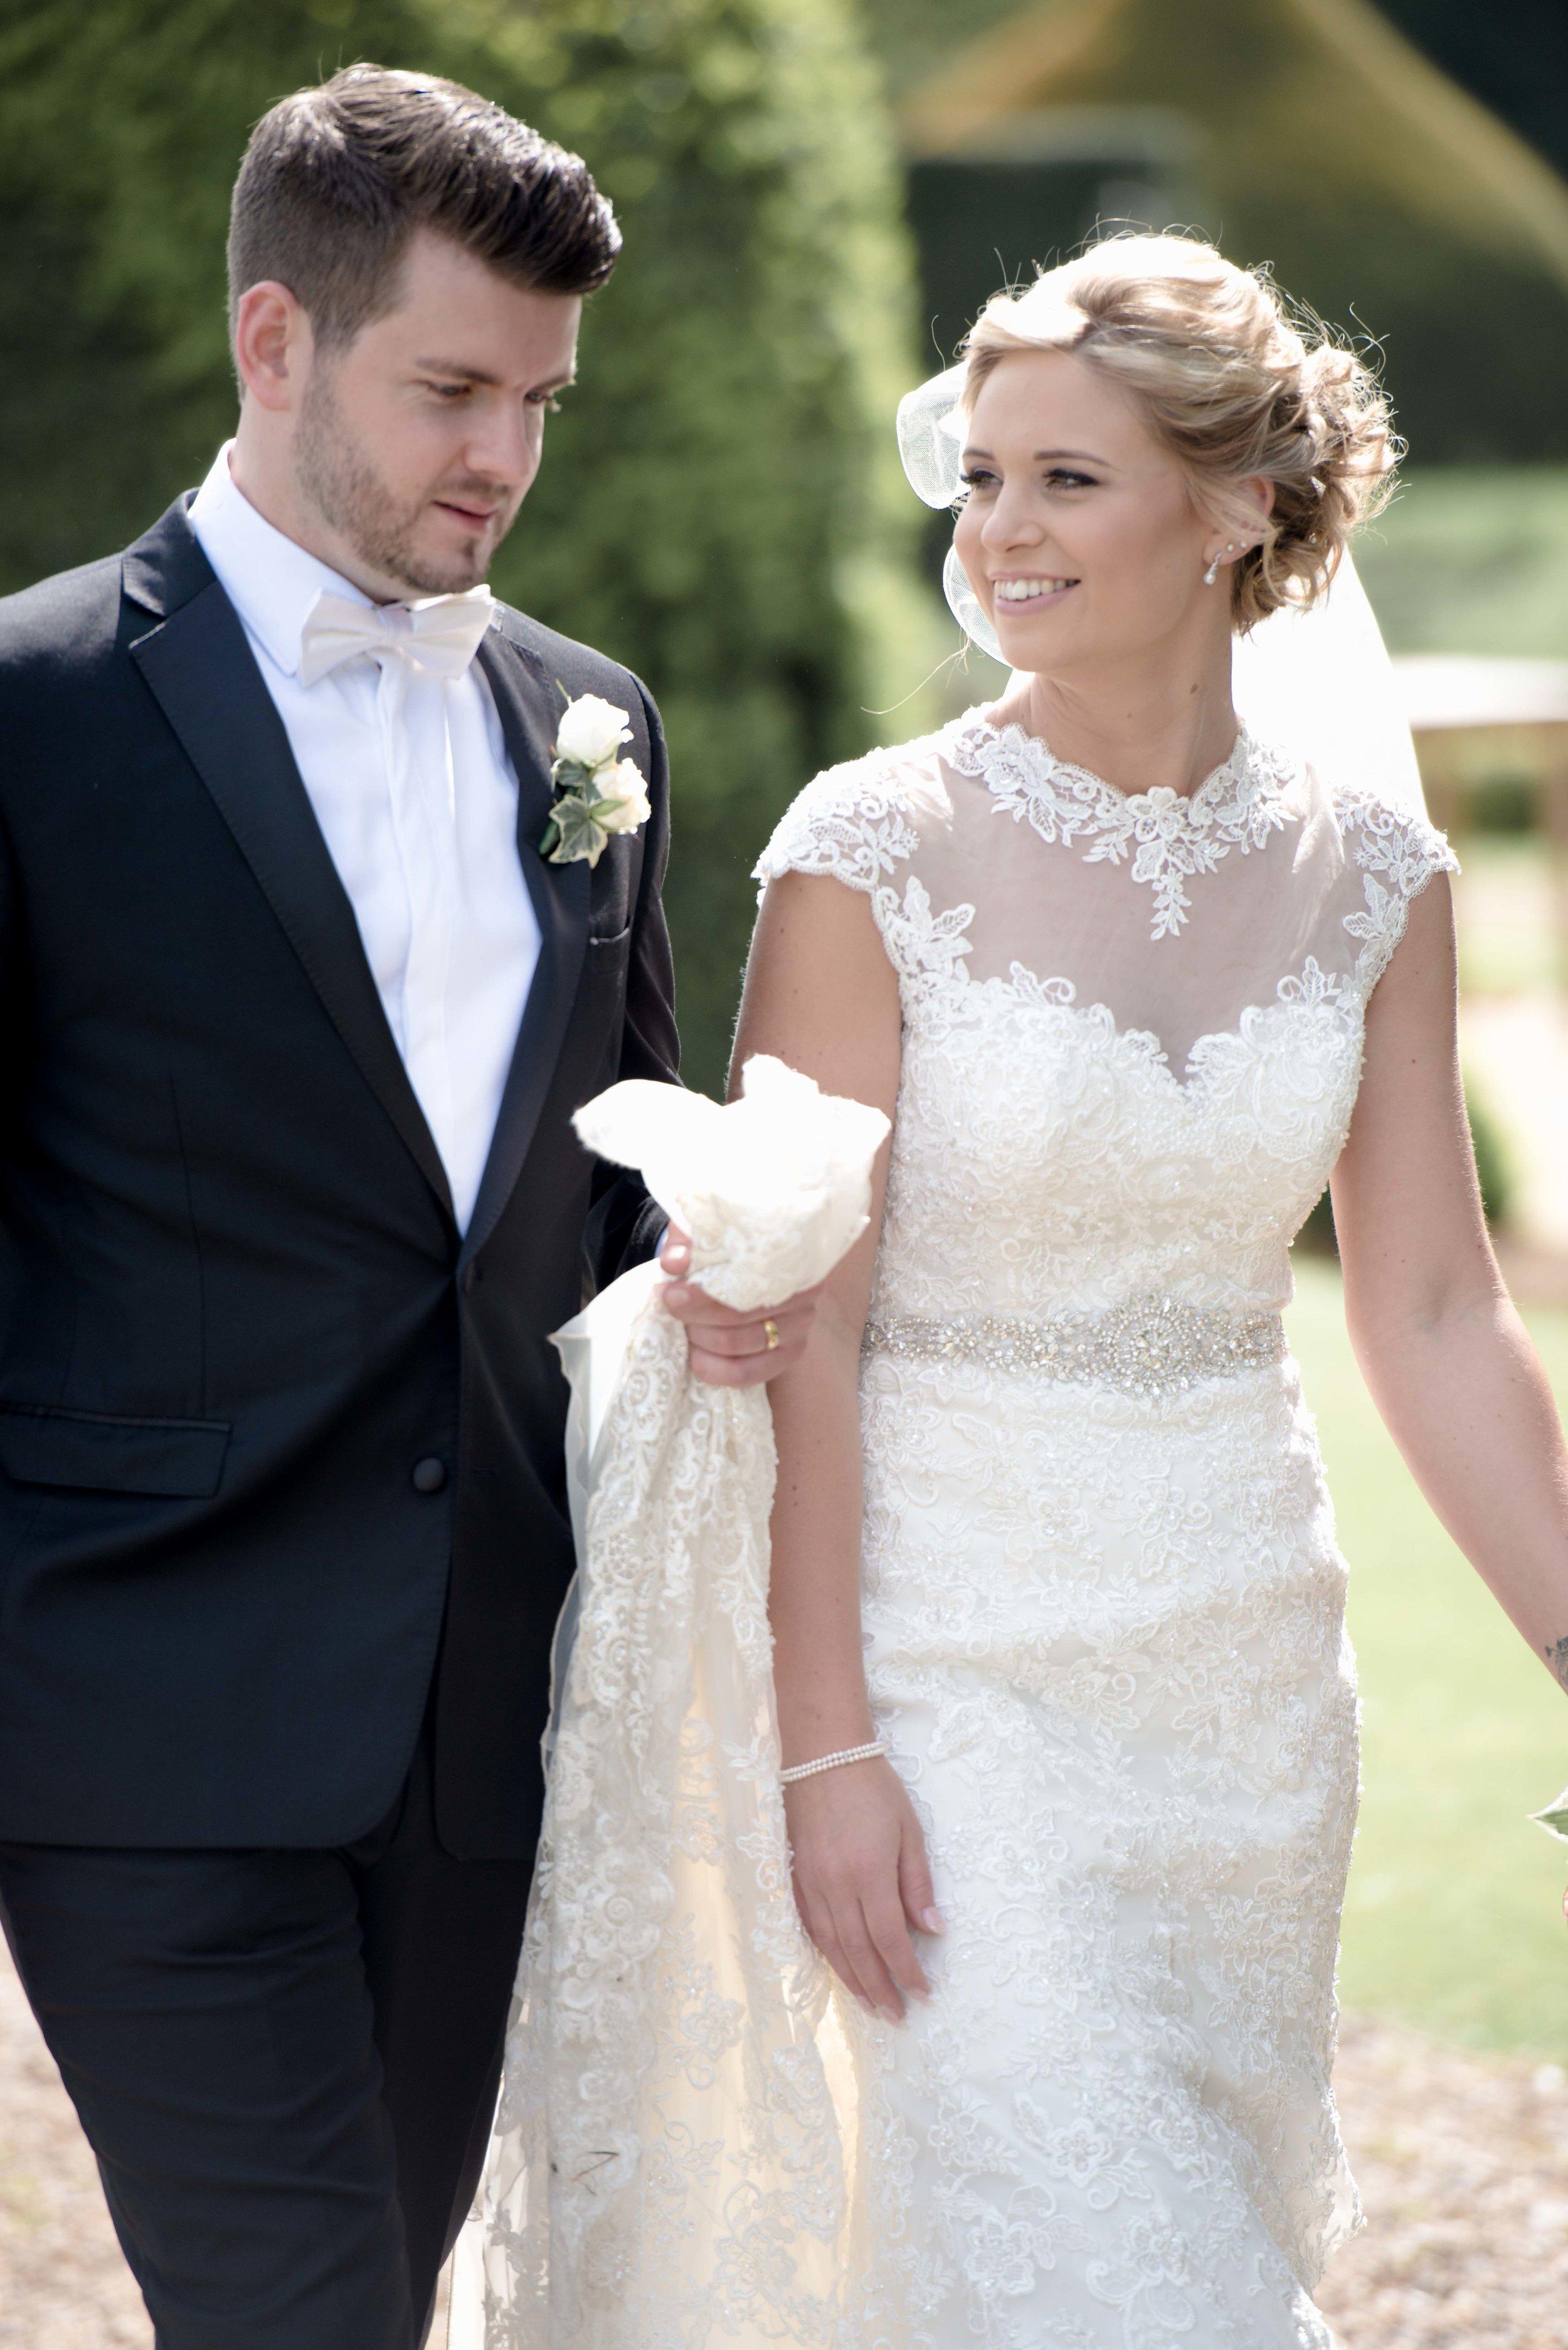 Amy and Brady's wedding at Stoke Rochford Hall